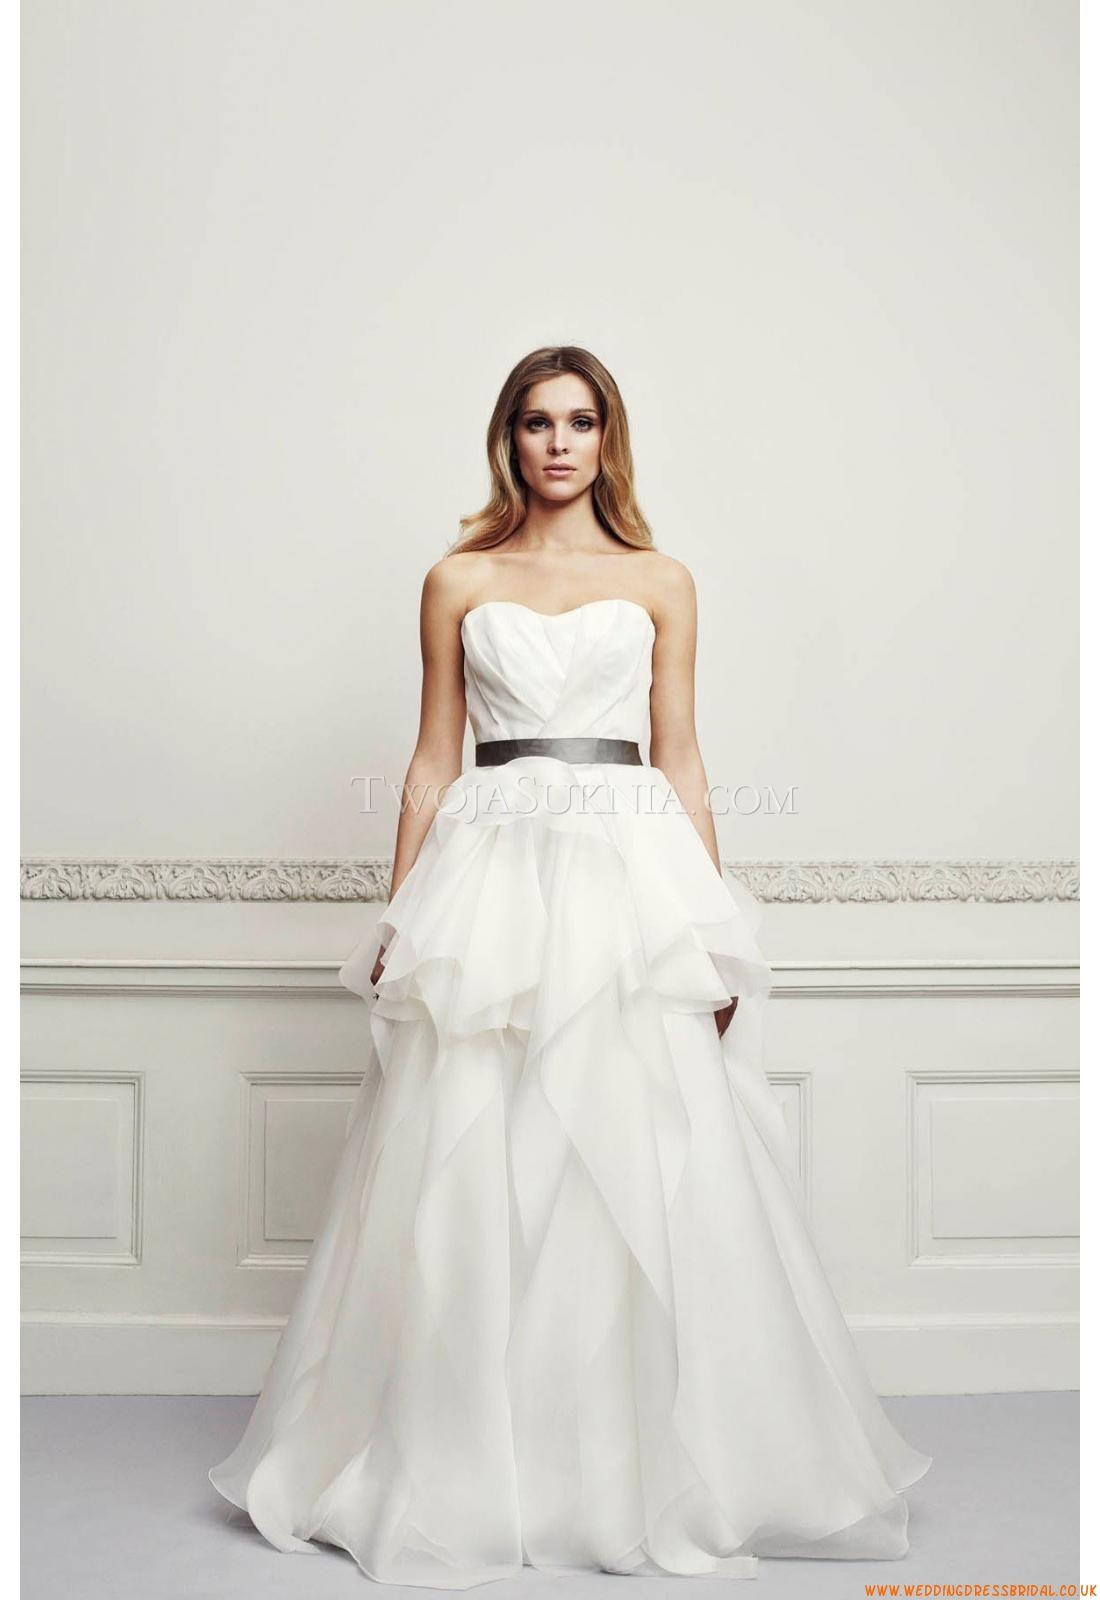 Wedding Dresses Zie 11 2013 | summer bridal gowns | Pinterest